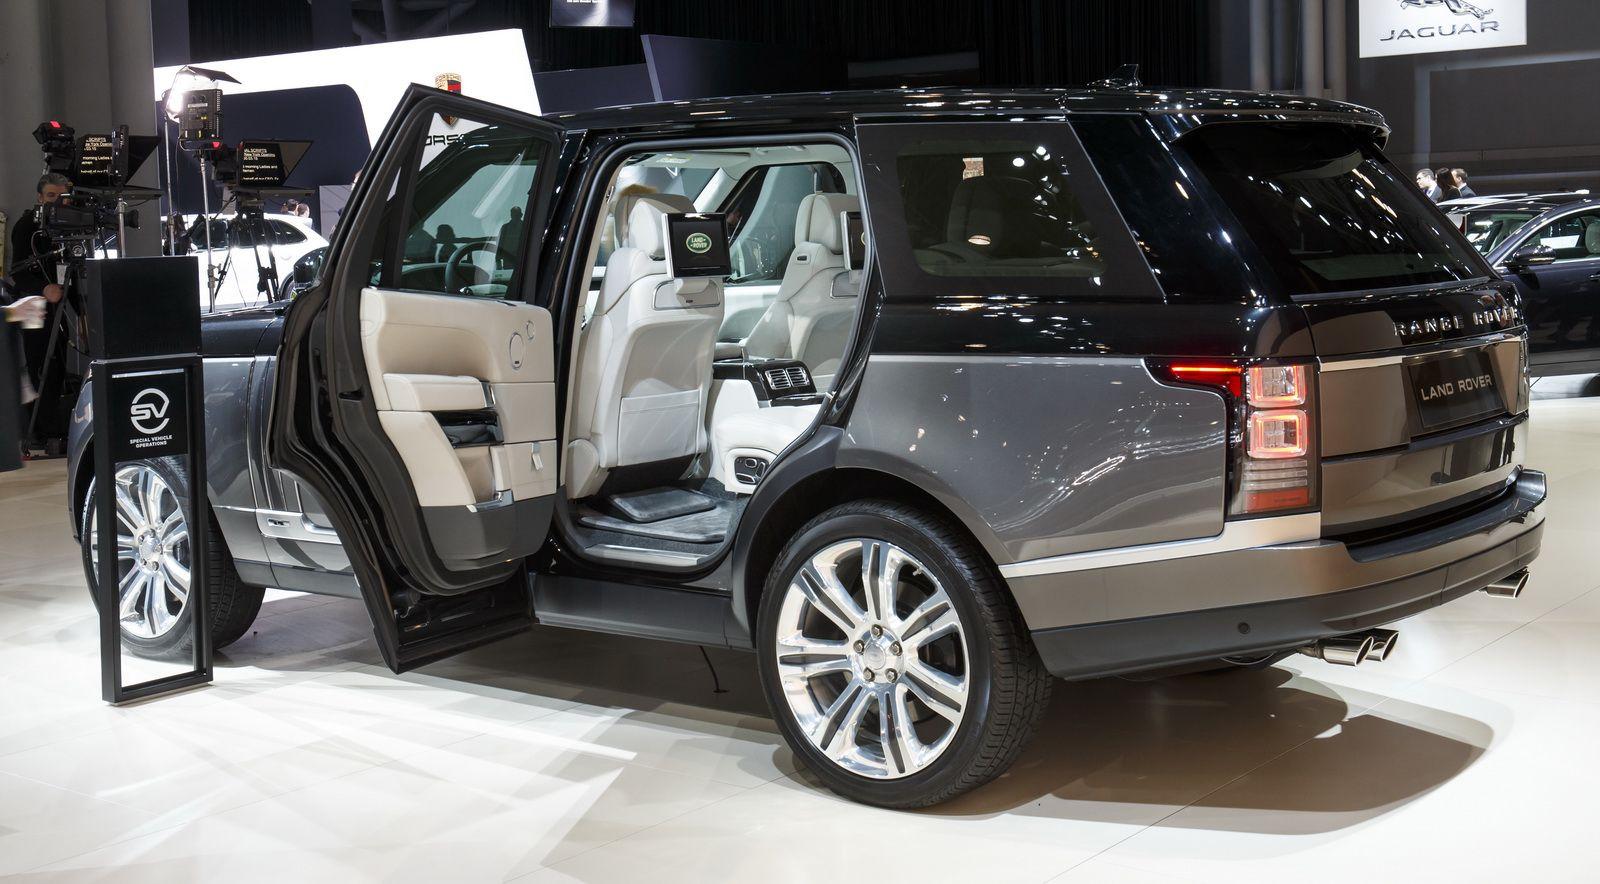 2016 Range Rover SVAutobiography Brings Ultimate 4x4